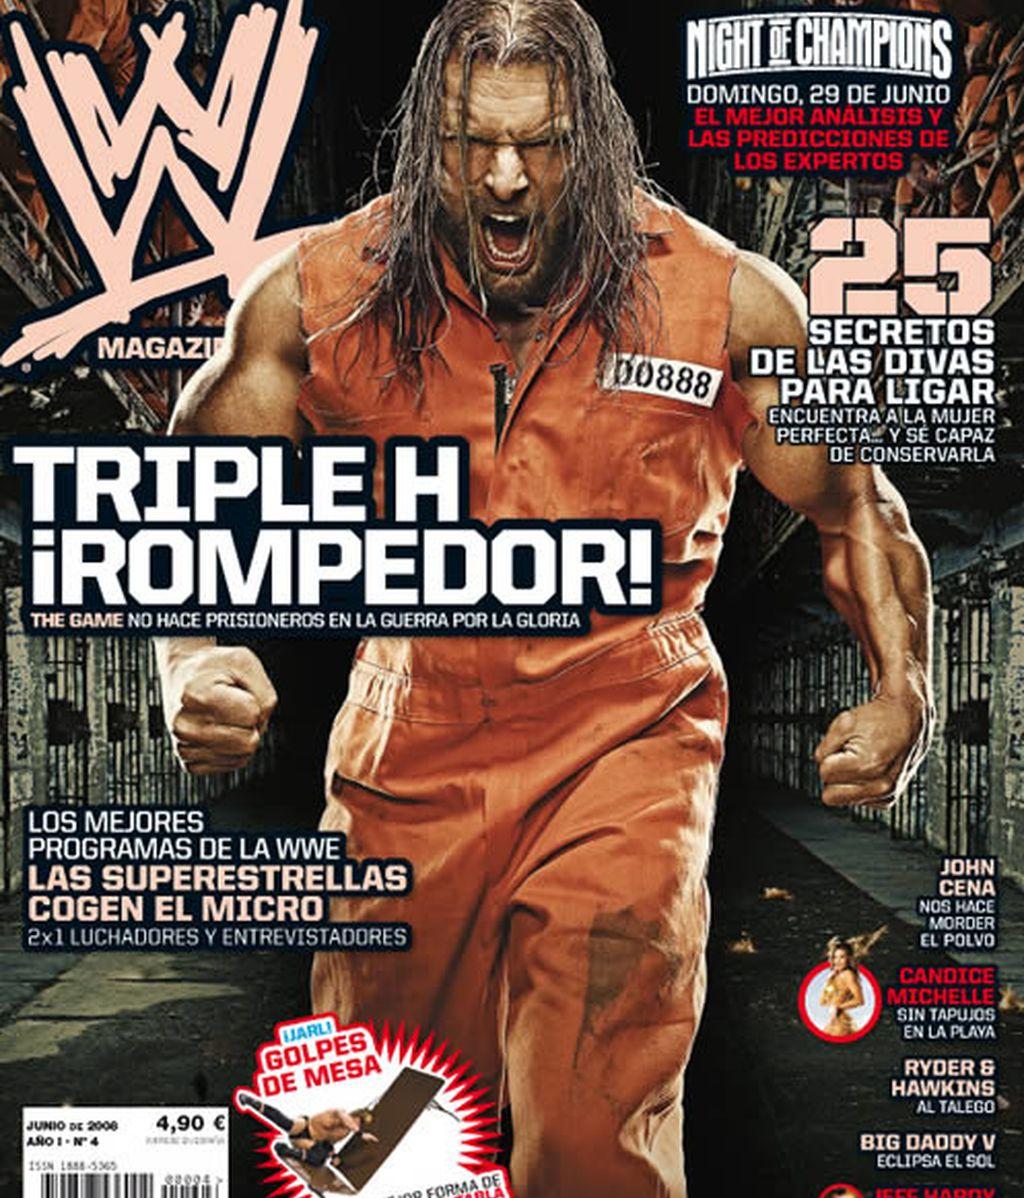 Revista junio 2008